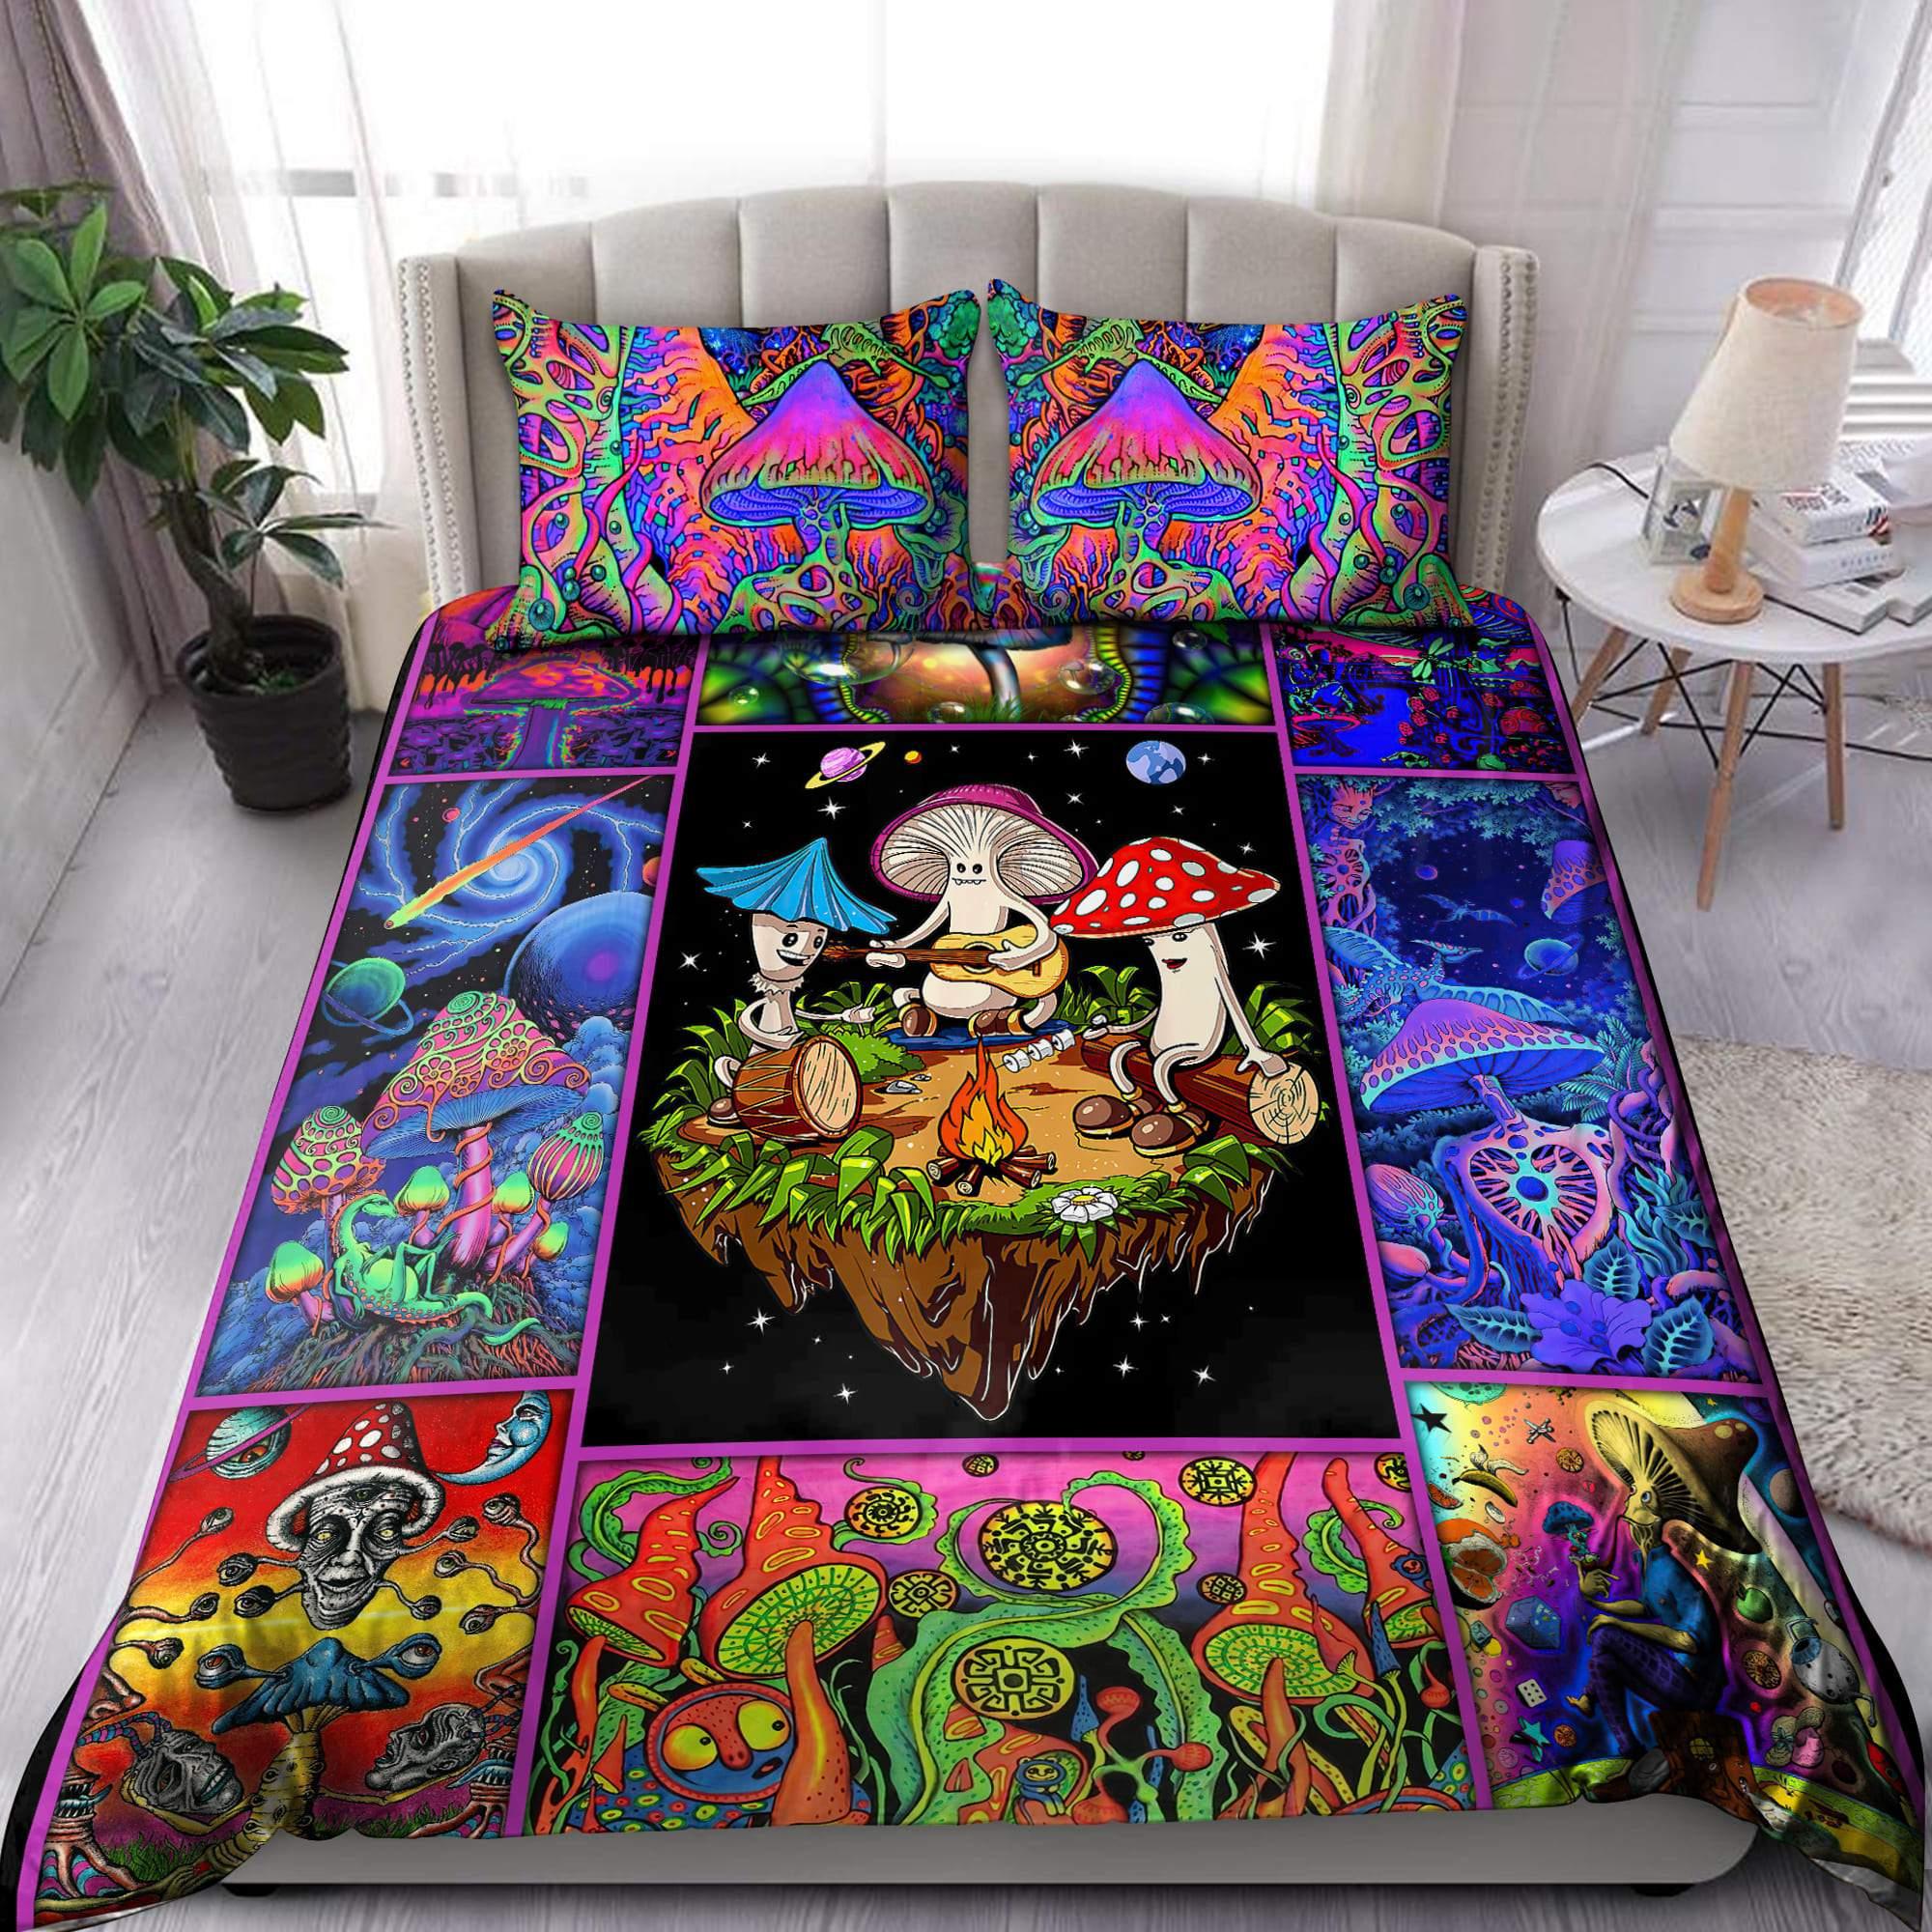 Colorful Mushroom Hippie Bedding Set